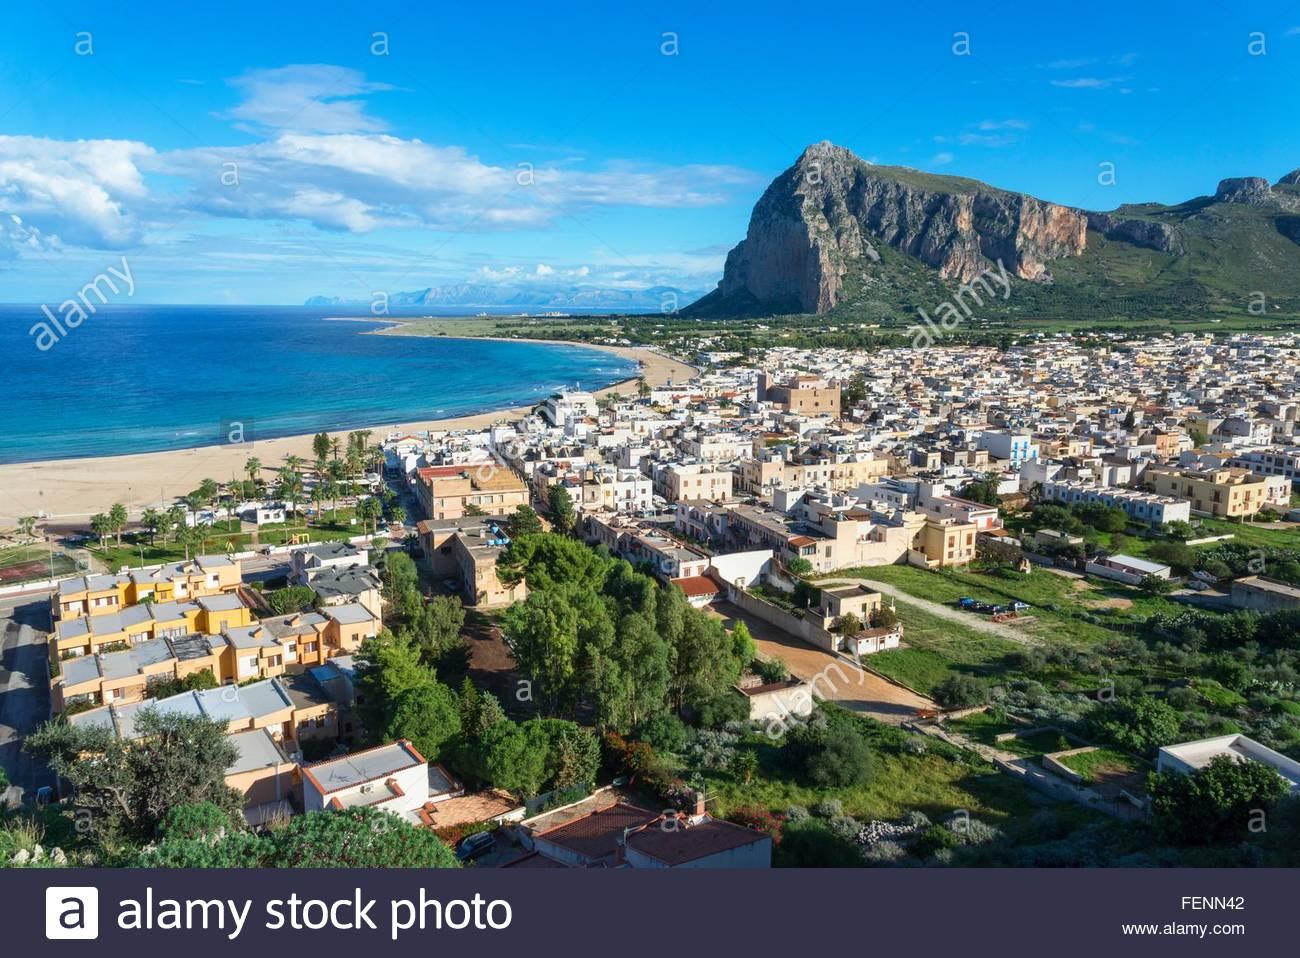 High angle view of San Vito Lo Capo, Sicily, Italy - Stock Image